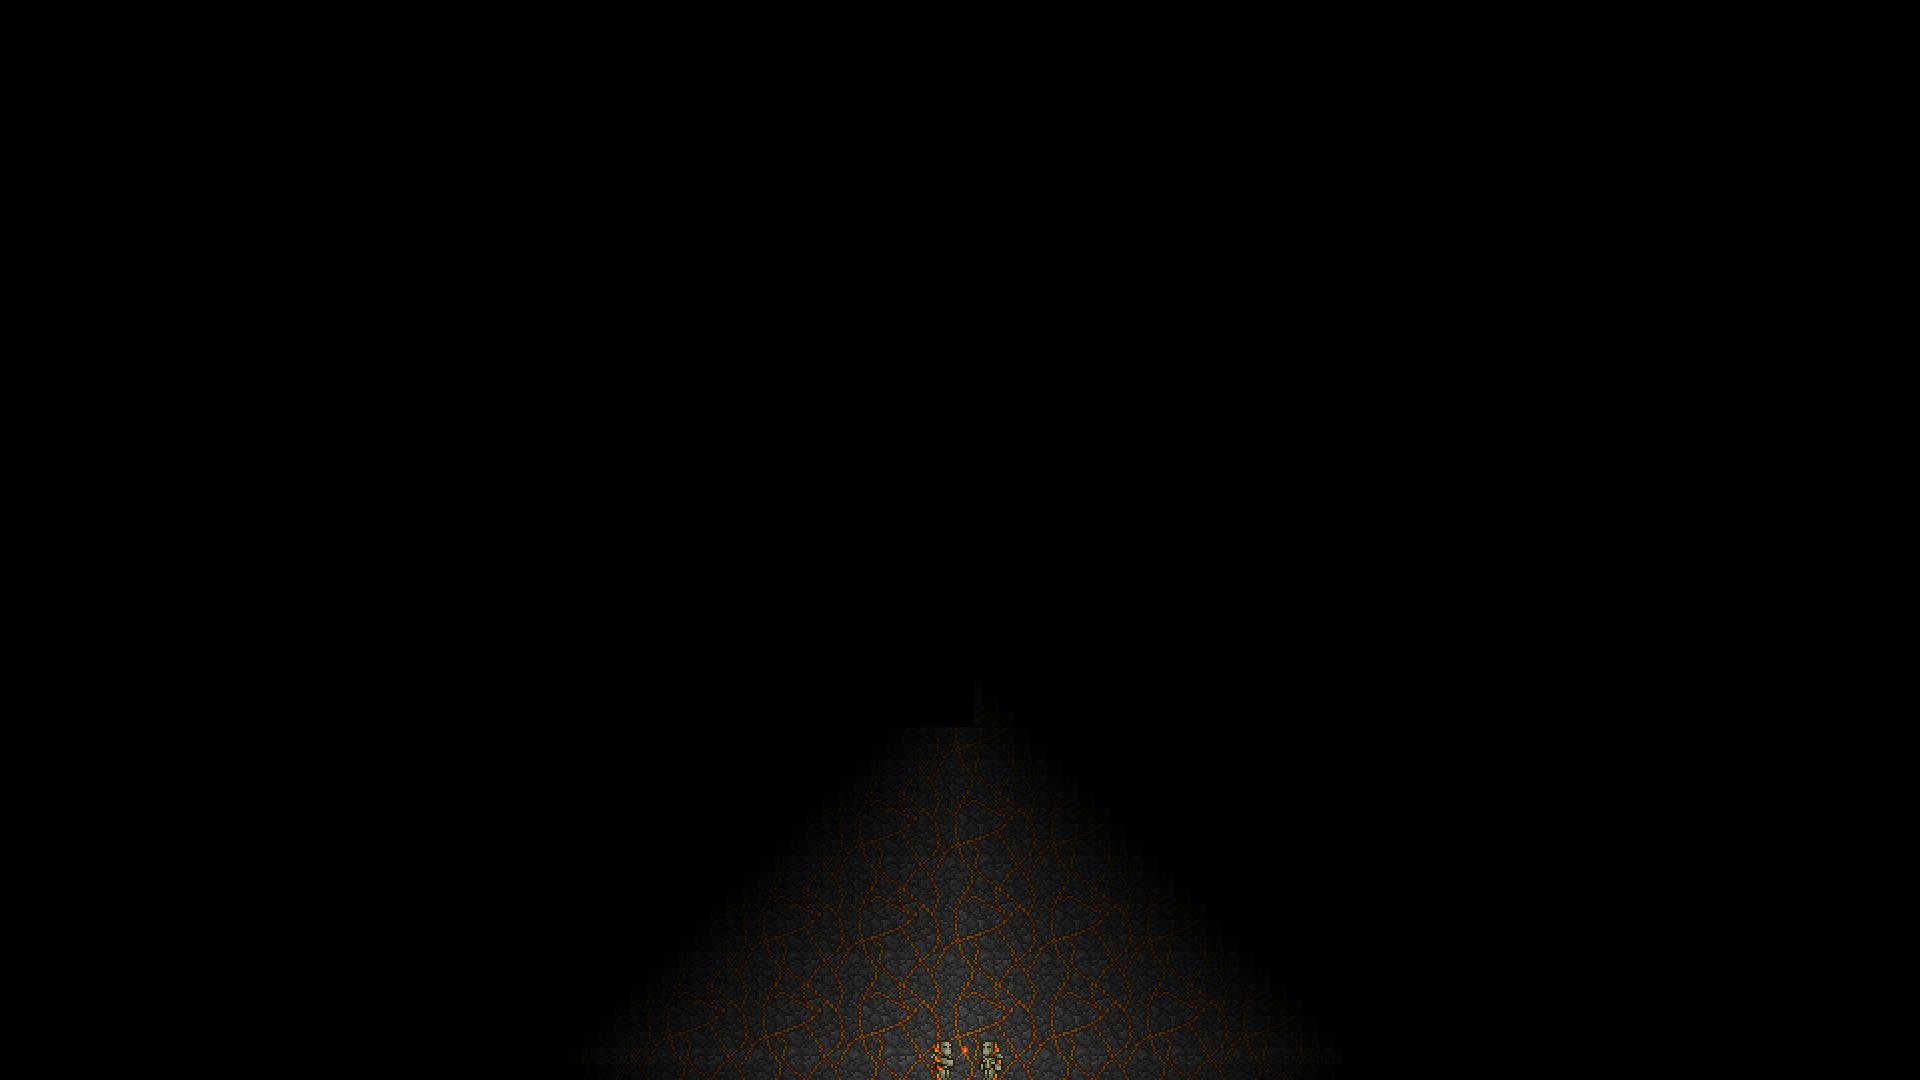 43 Dark Minimal Wallpaper On Wallpapersafari